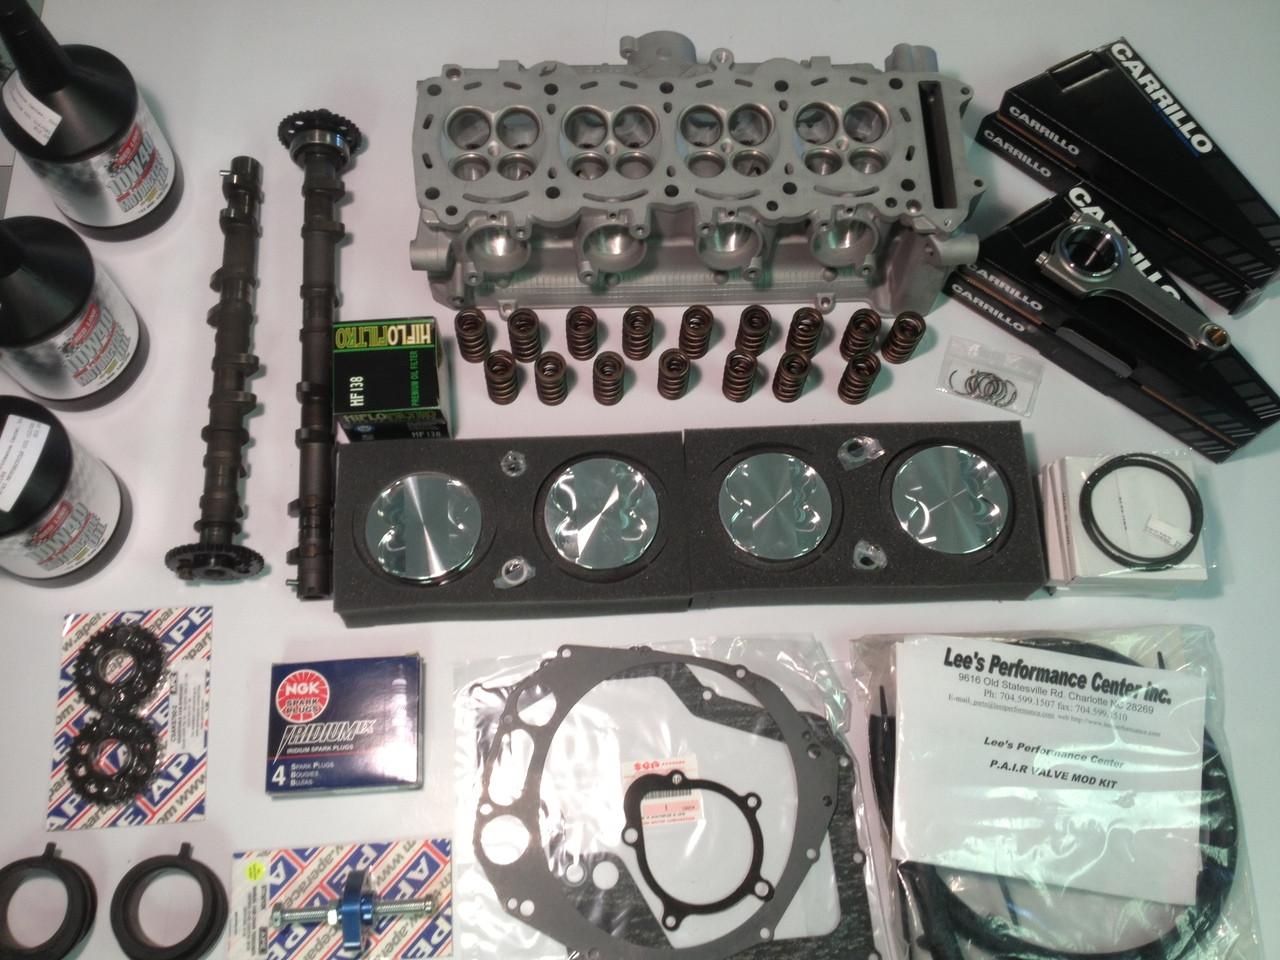 2008-18 Hayabusa Stage 4 PLUS (1470) Engine Build 235-245HP